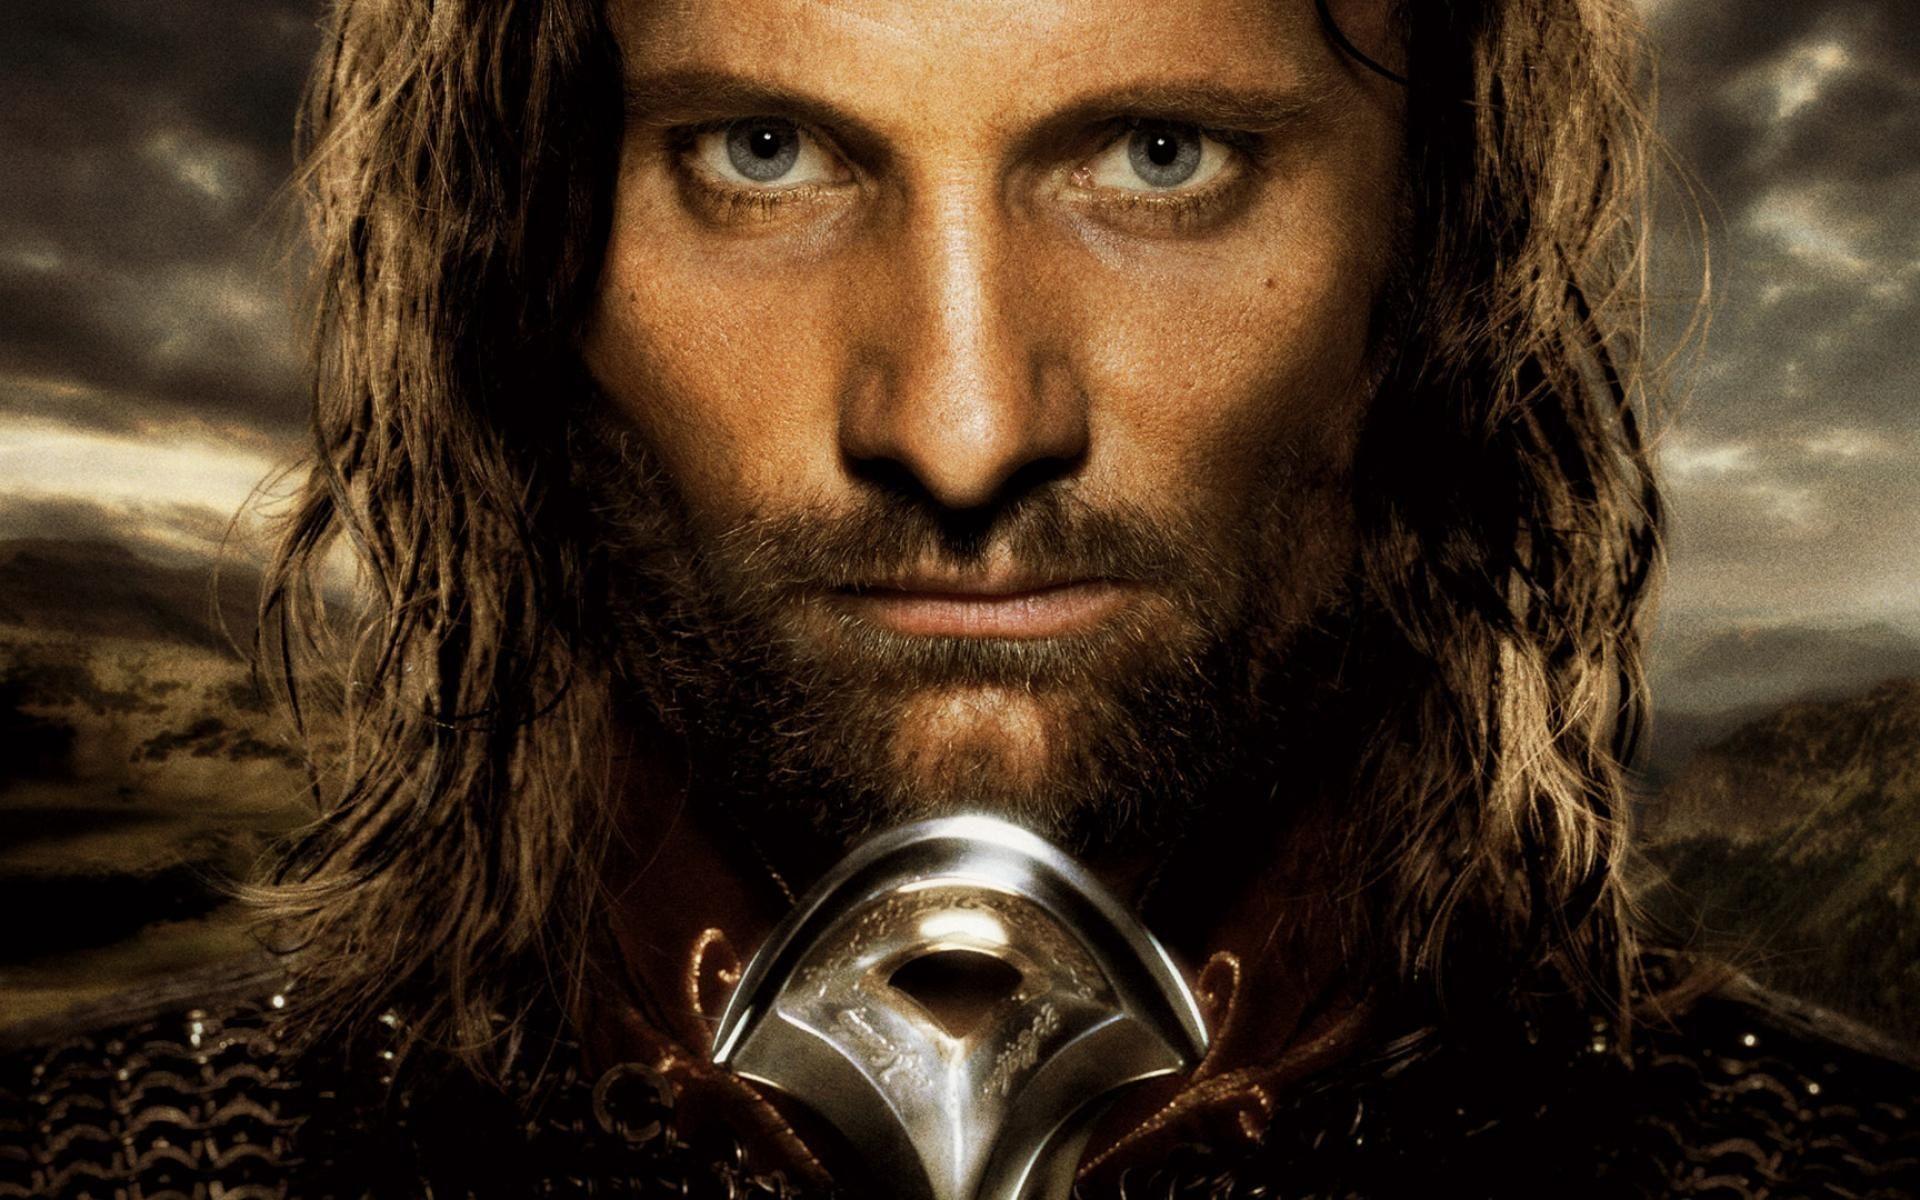 Lotr Aragorn Wallpapers Top Free Lotr Aragorn Backgrounds